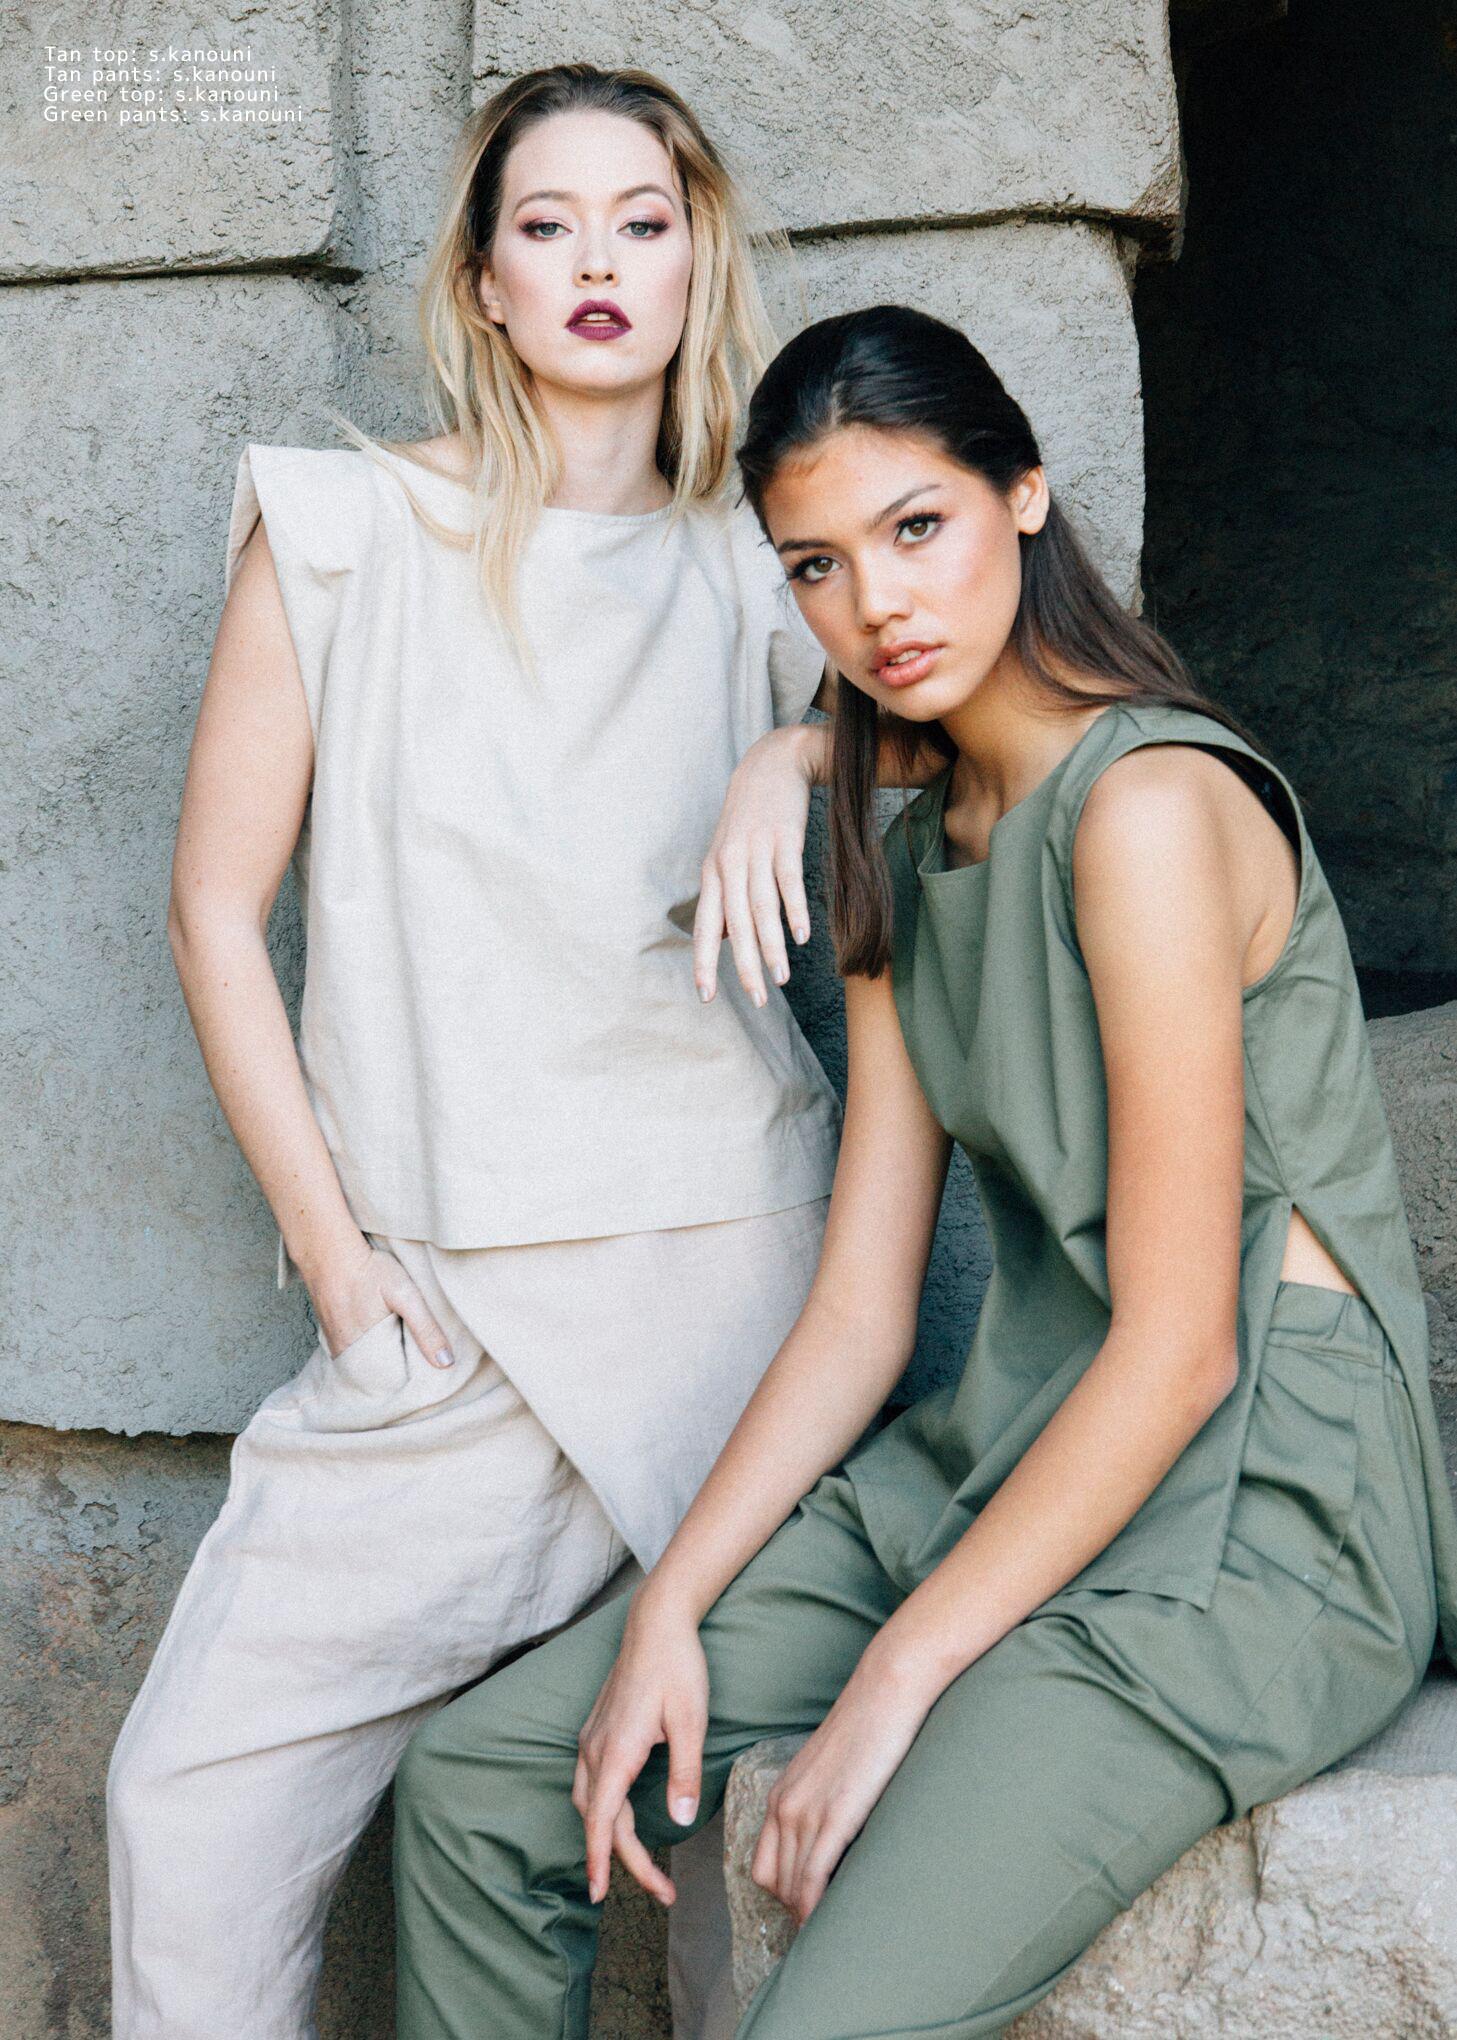 seanhazen_fashion_LAModels_testshoot_005_preview copy.jpg